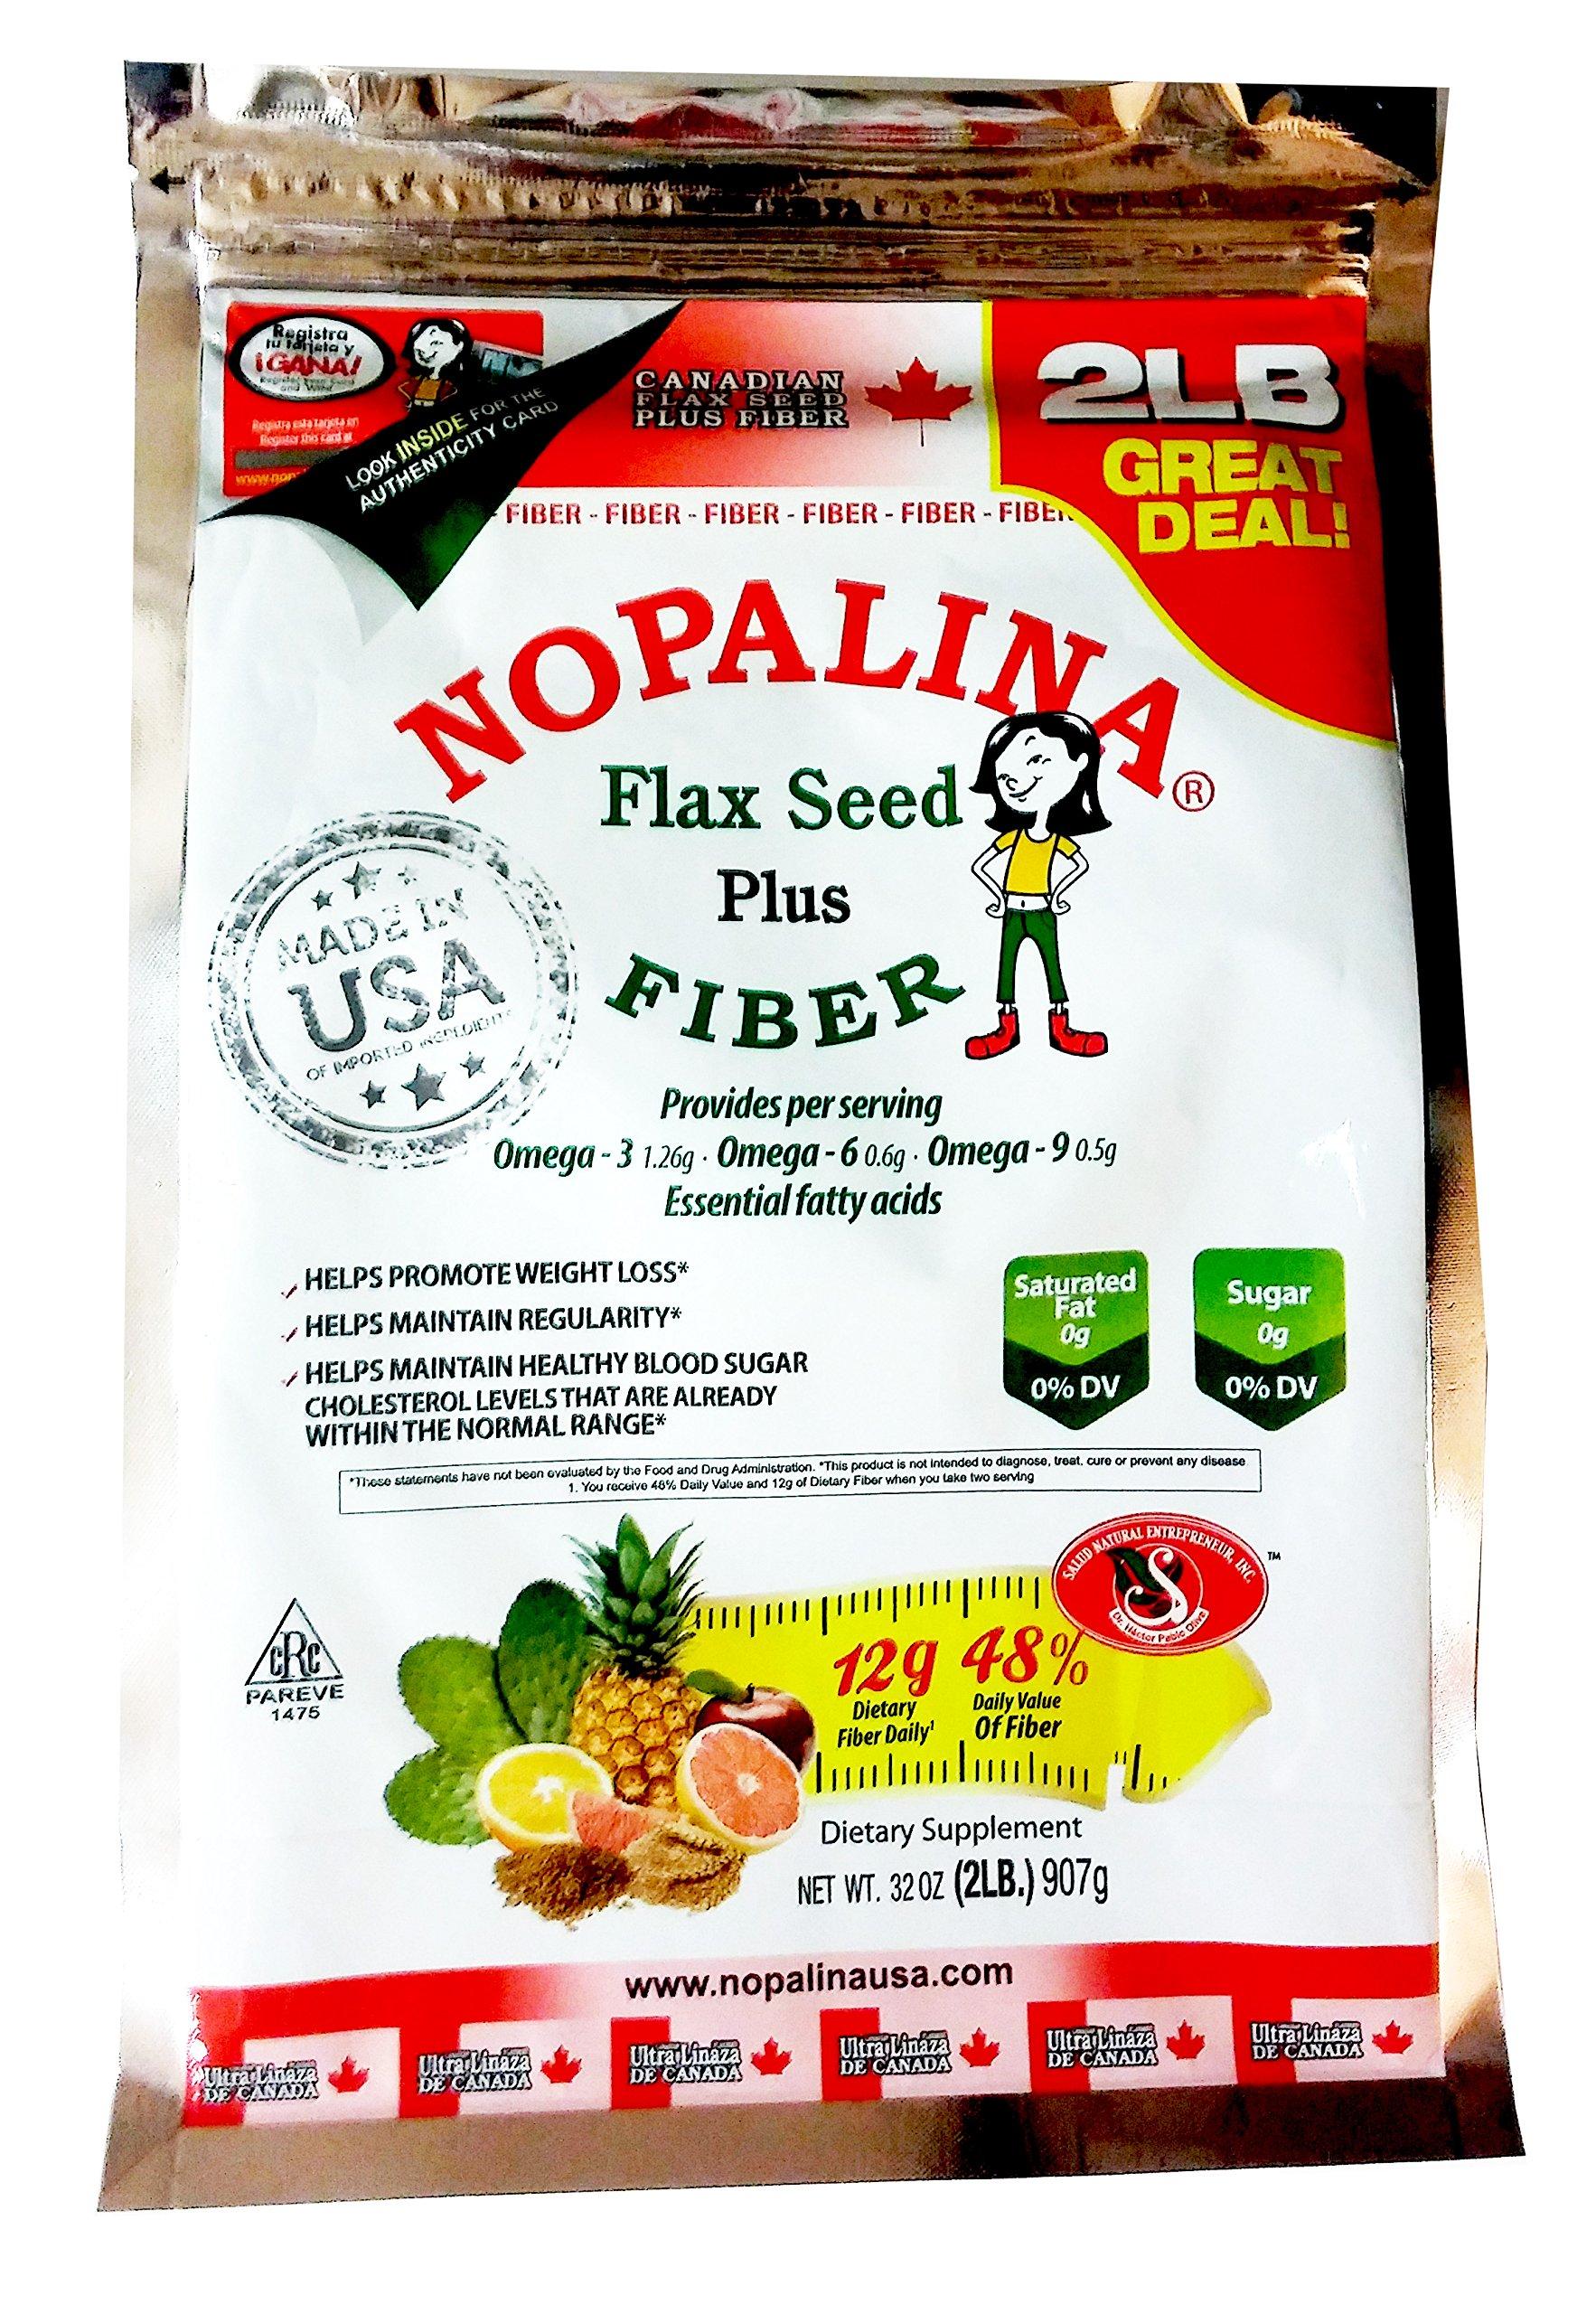 Nopalina Flax Seed Plus Fiber 32 oz (2 lb) With Free Shaker